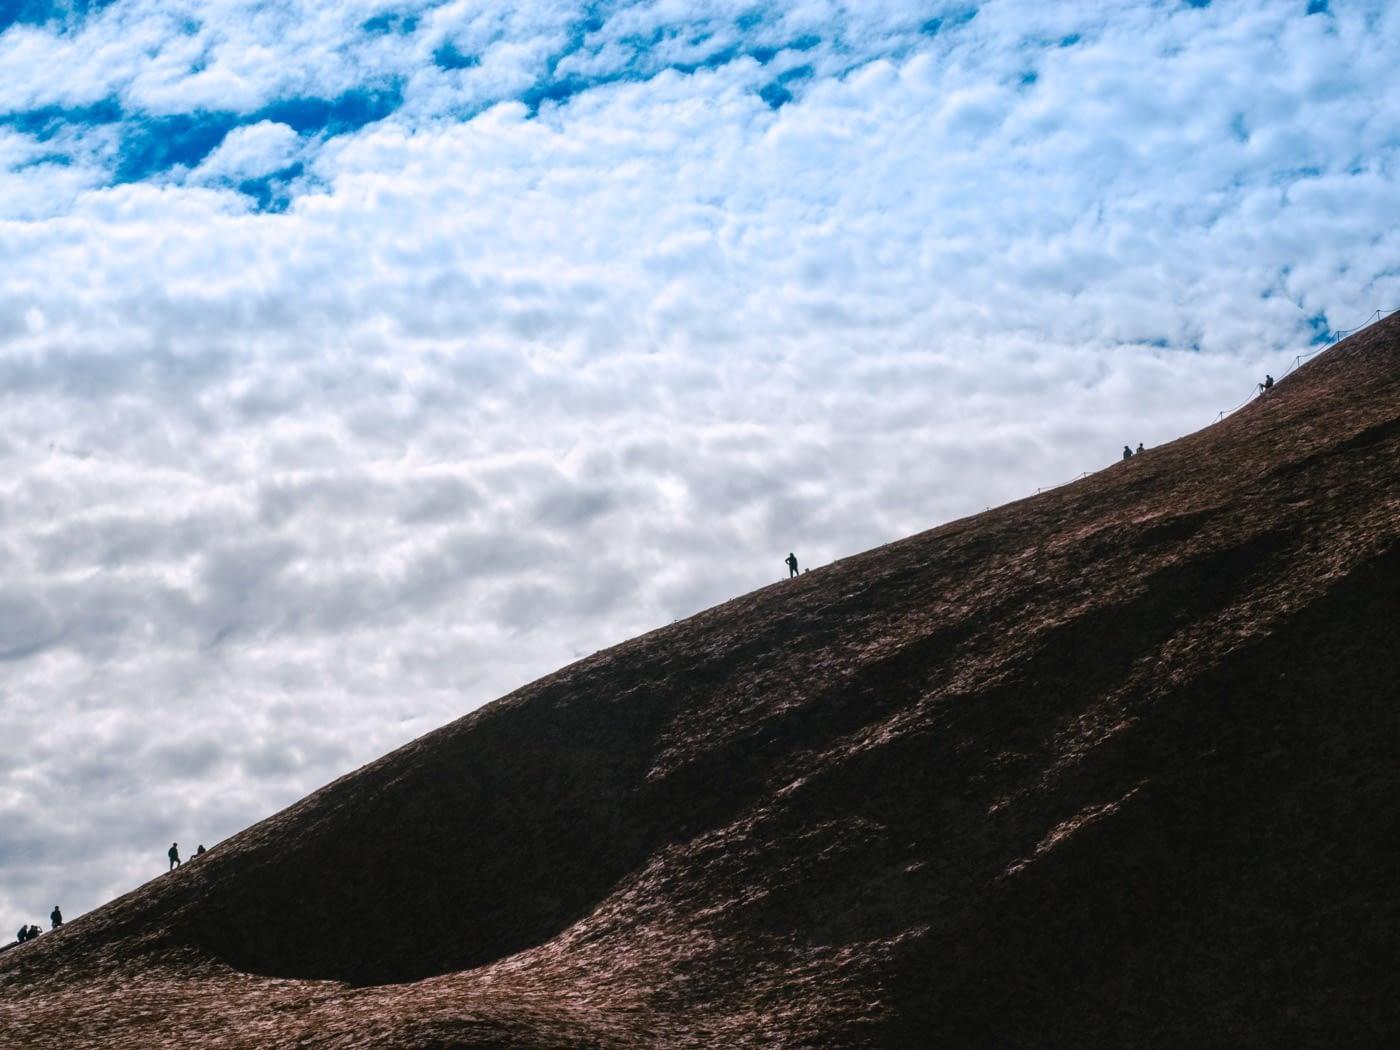 NT Australia - Tourist climbing Uluru